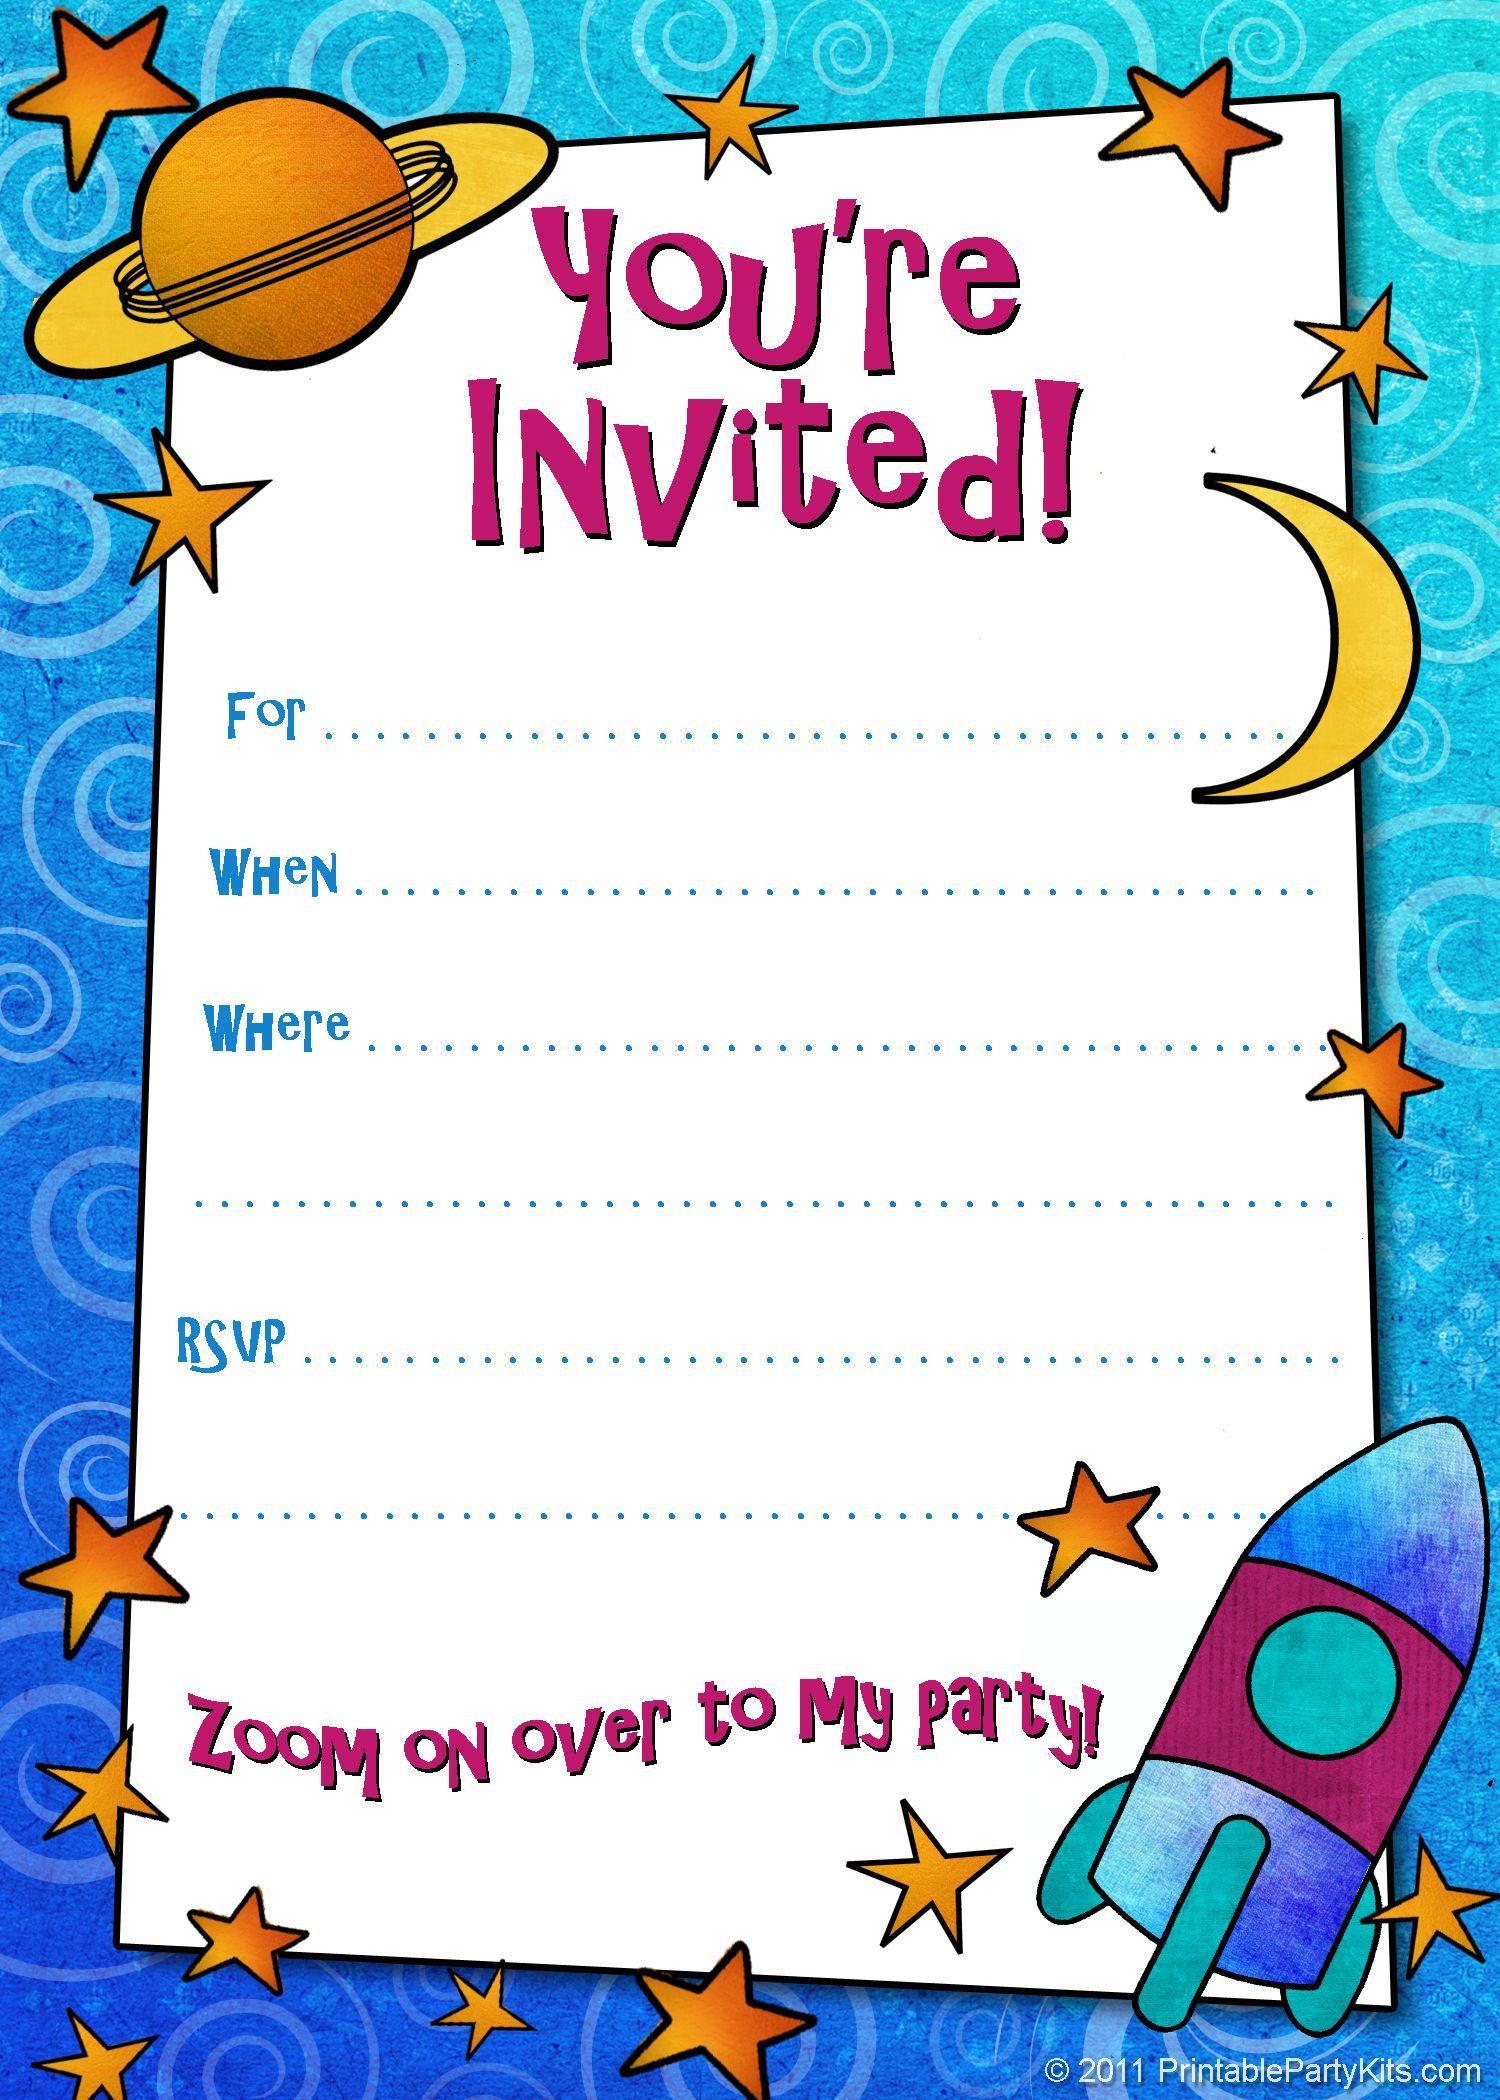 Free Printable Boys Birthday Party Invitations | Birthday Party - Free Printable Birthday Invitation Cards